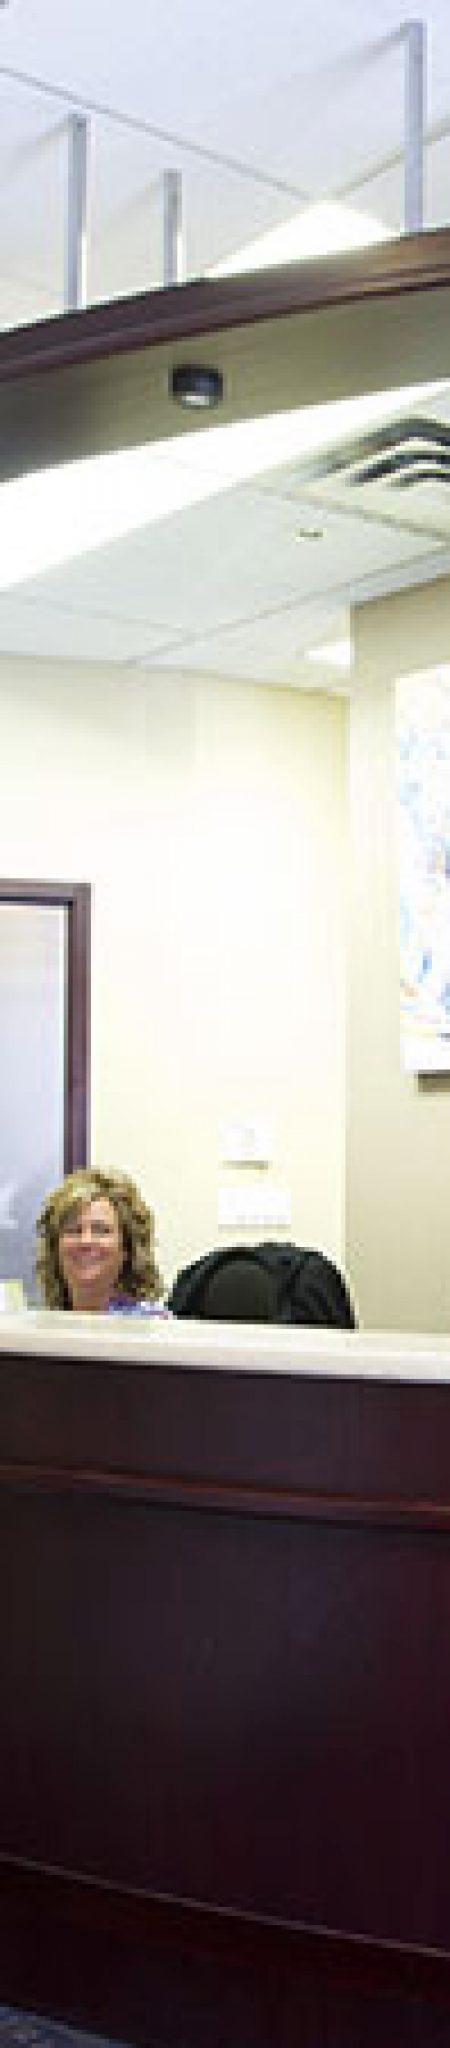 t2 Tour Our Office